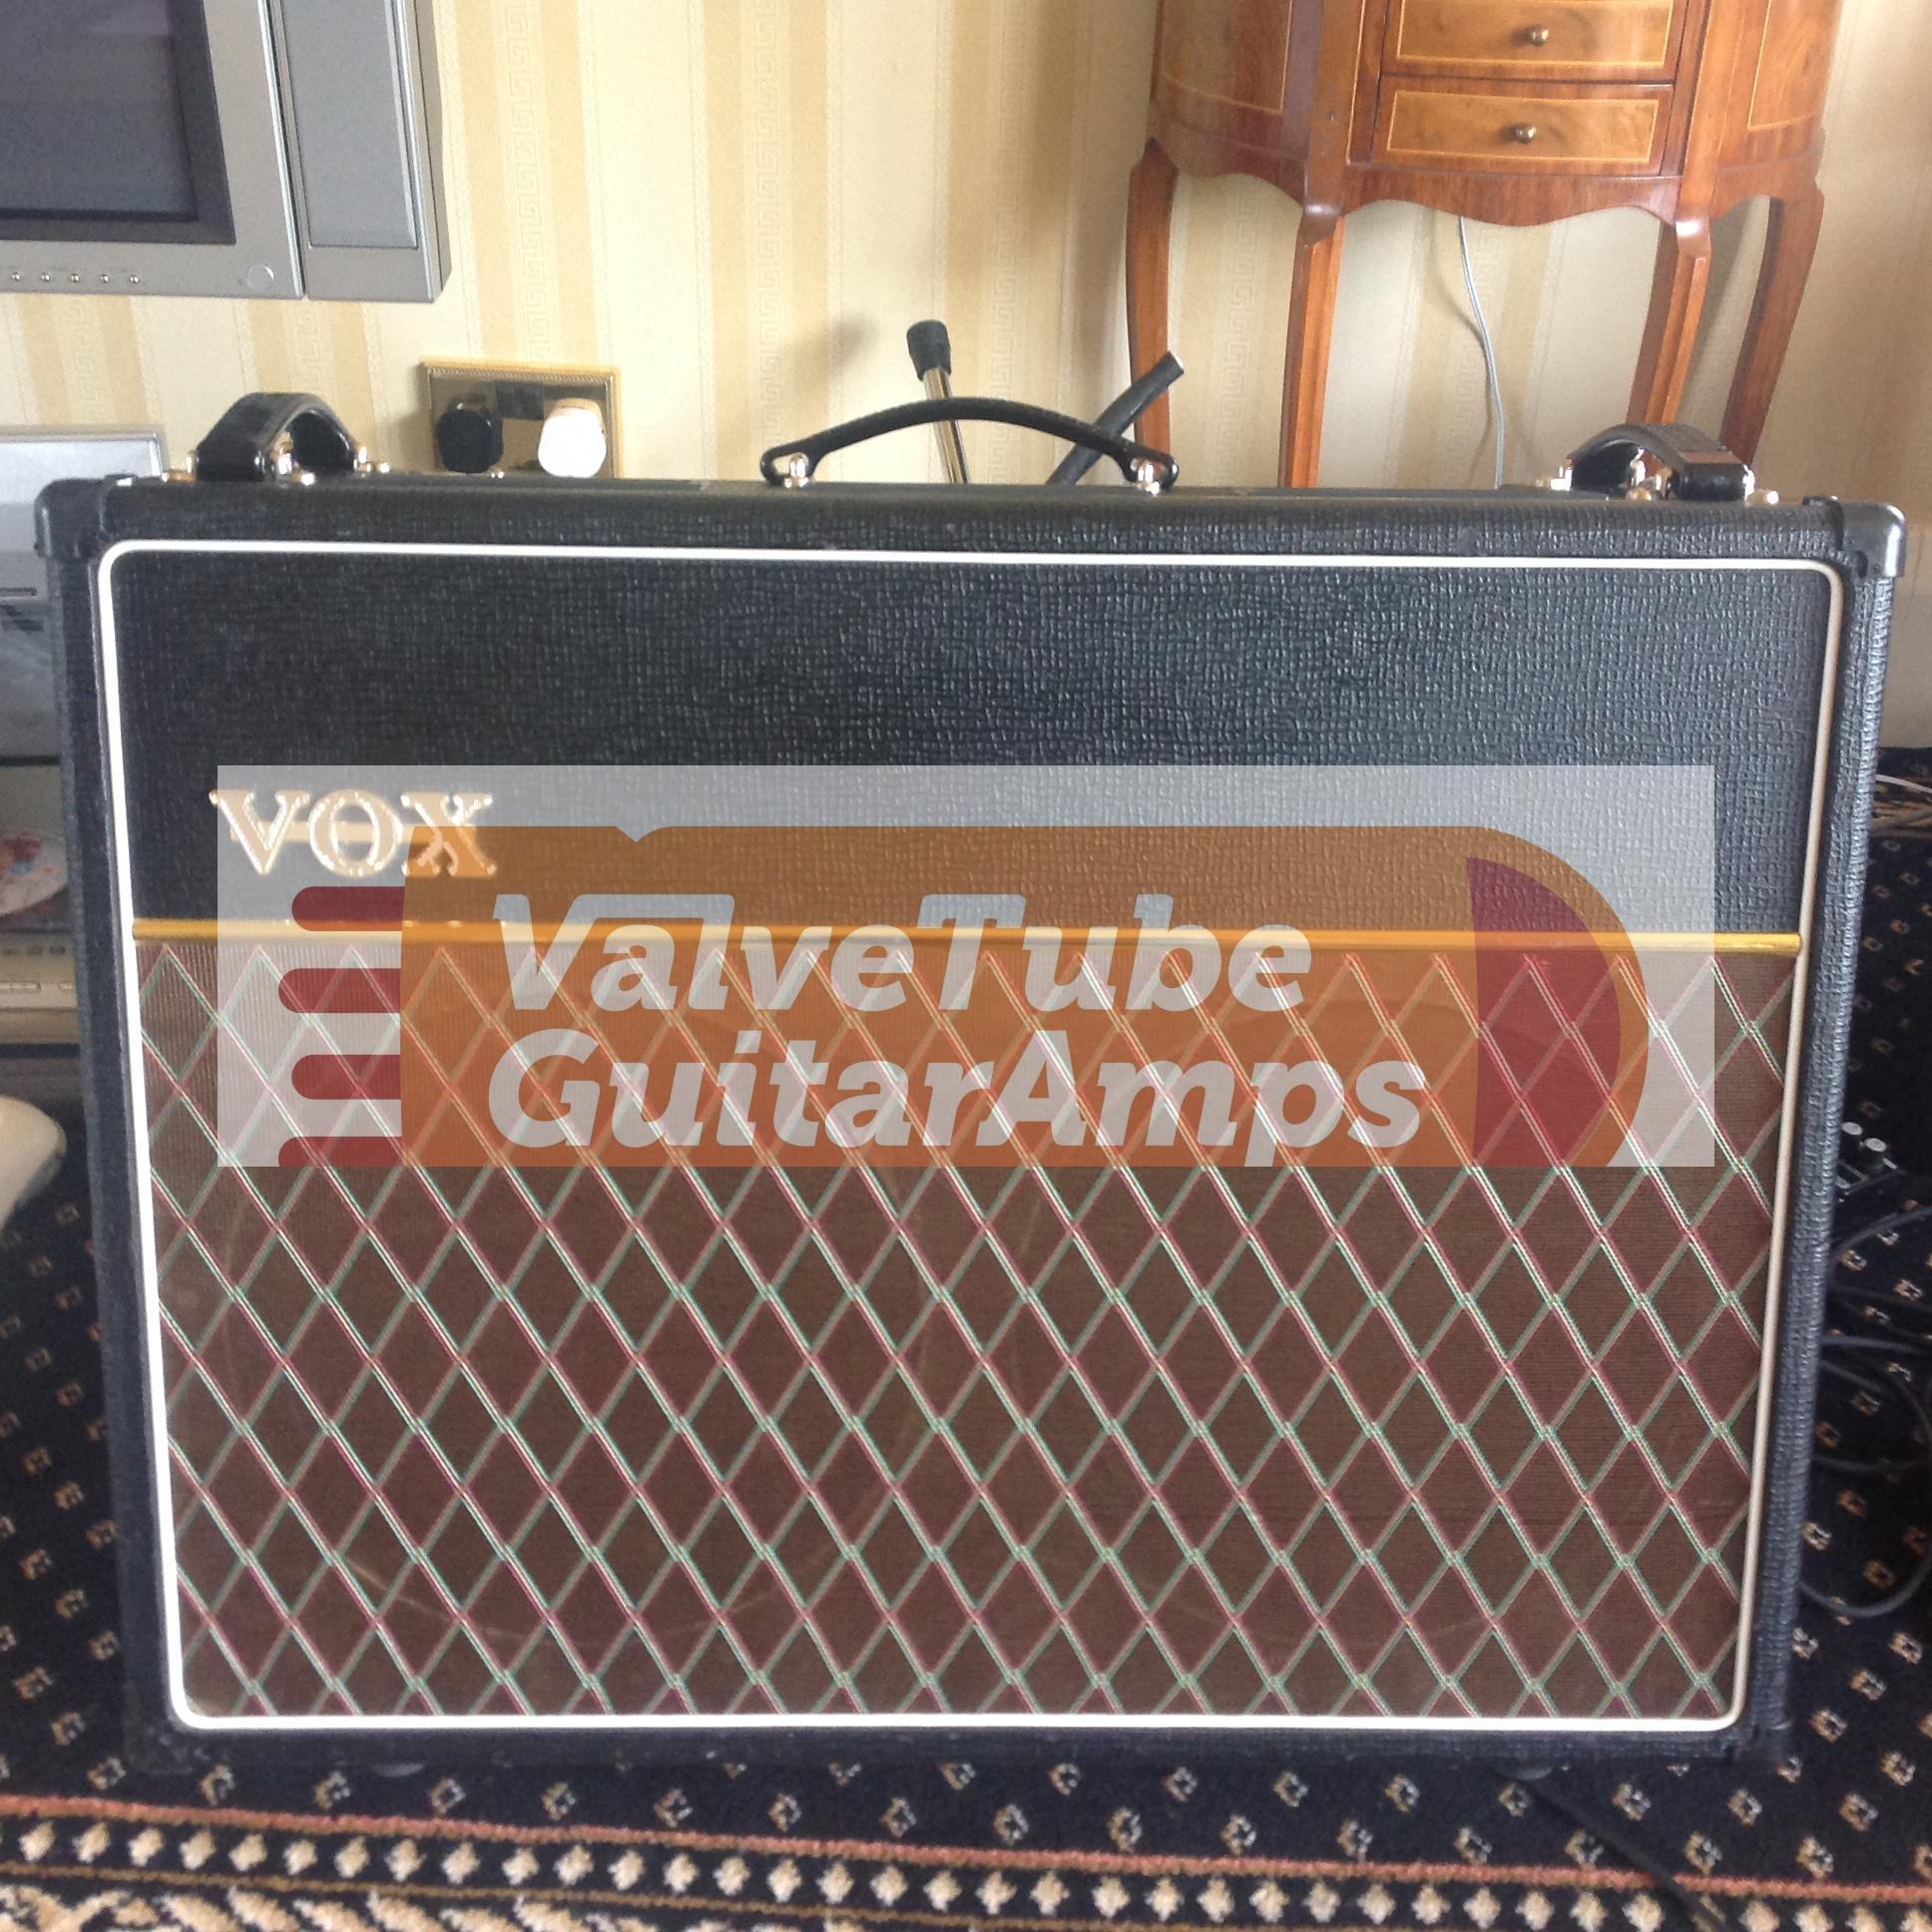 Vox AC30 CC1 CC2 CCX2 Valve Kit Amp Image